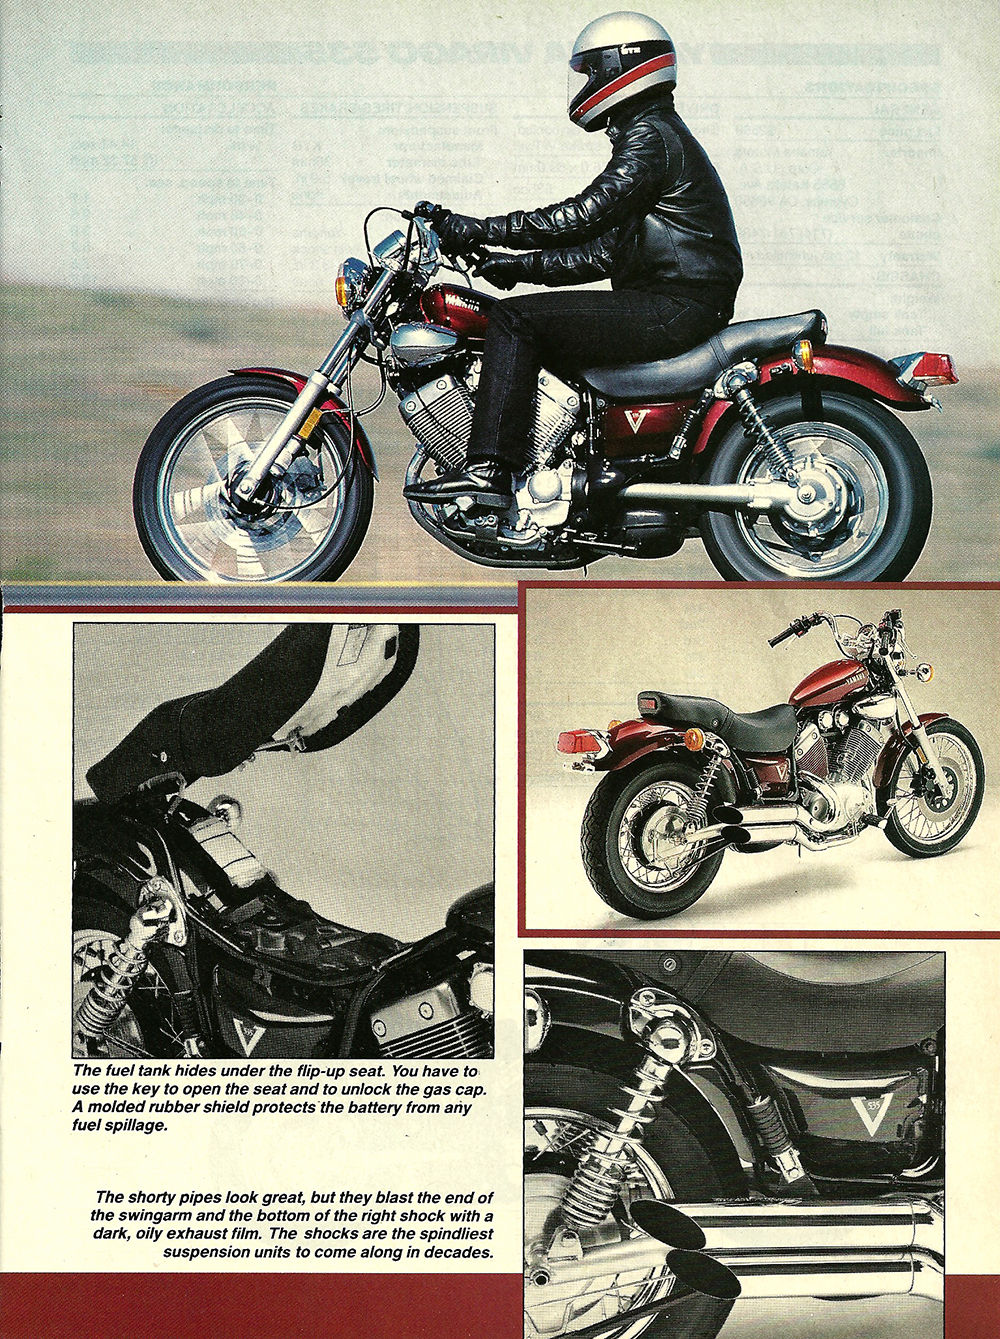 1987 Yamaha Virago 535 road test 04.jpg